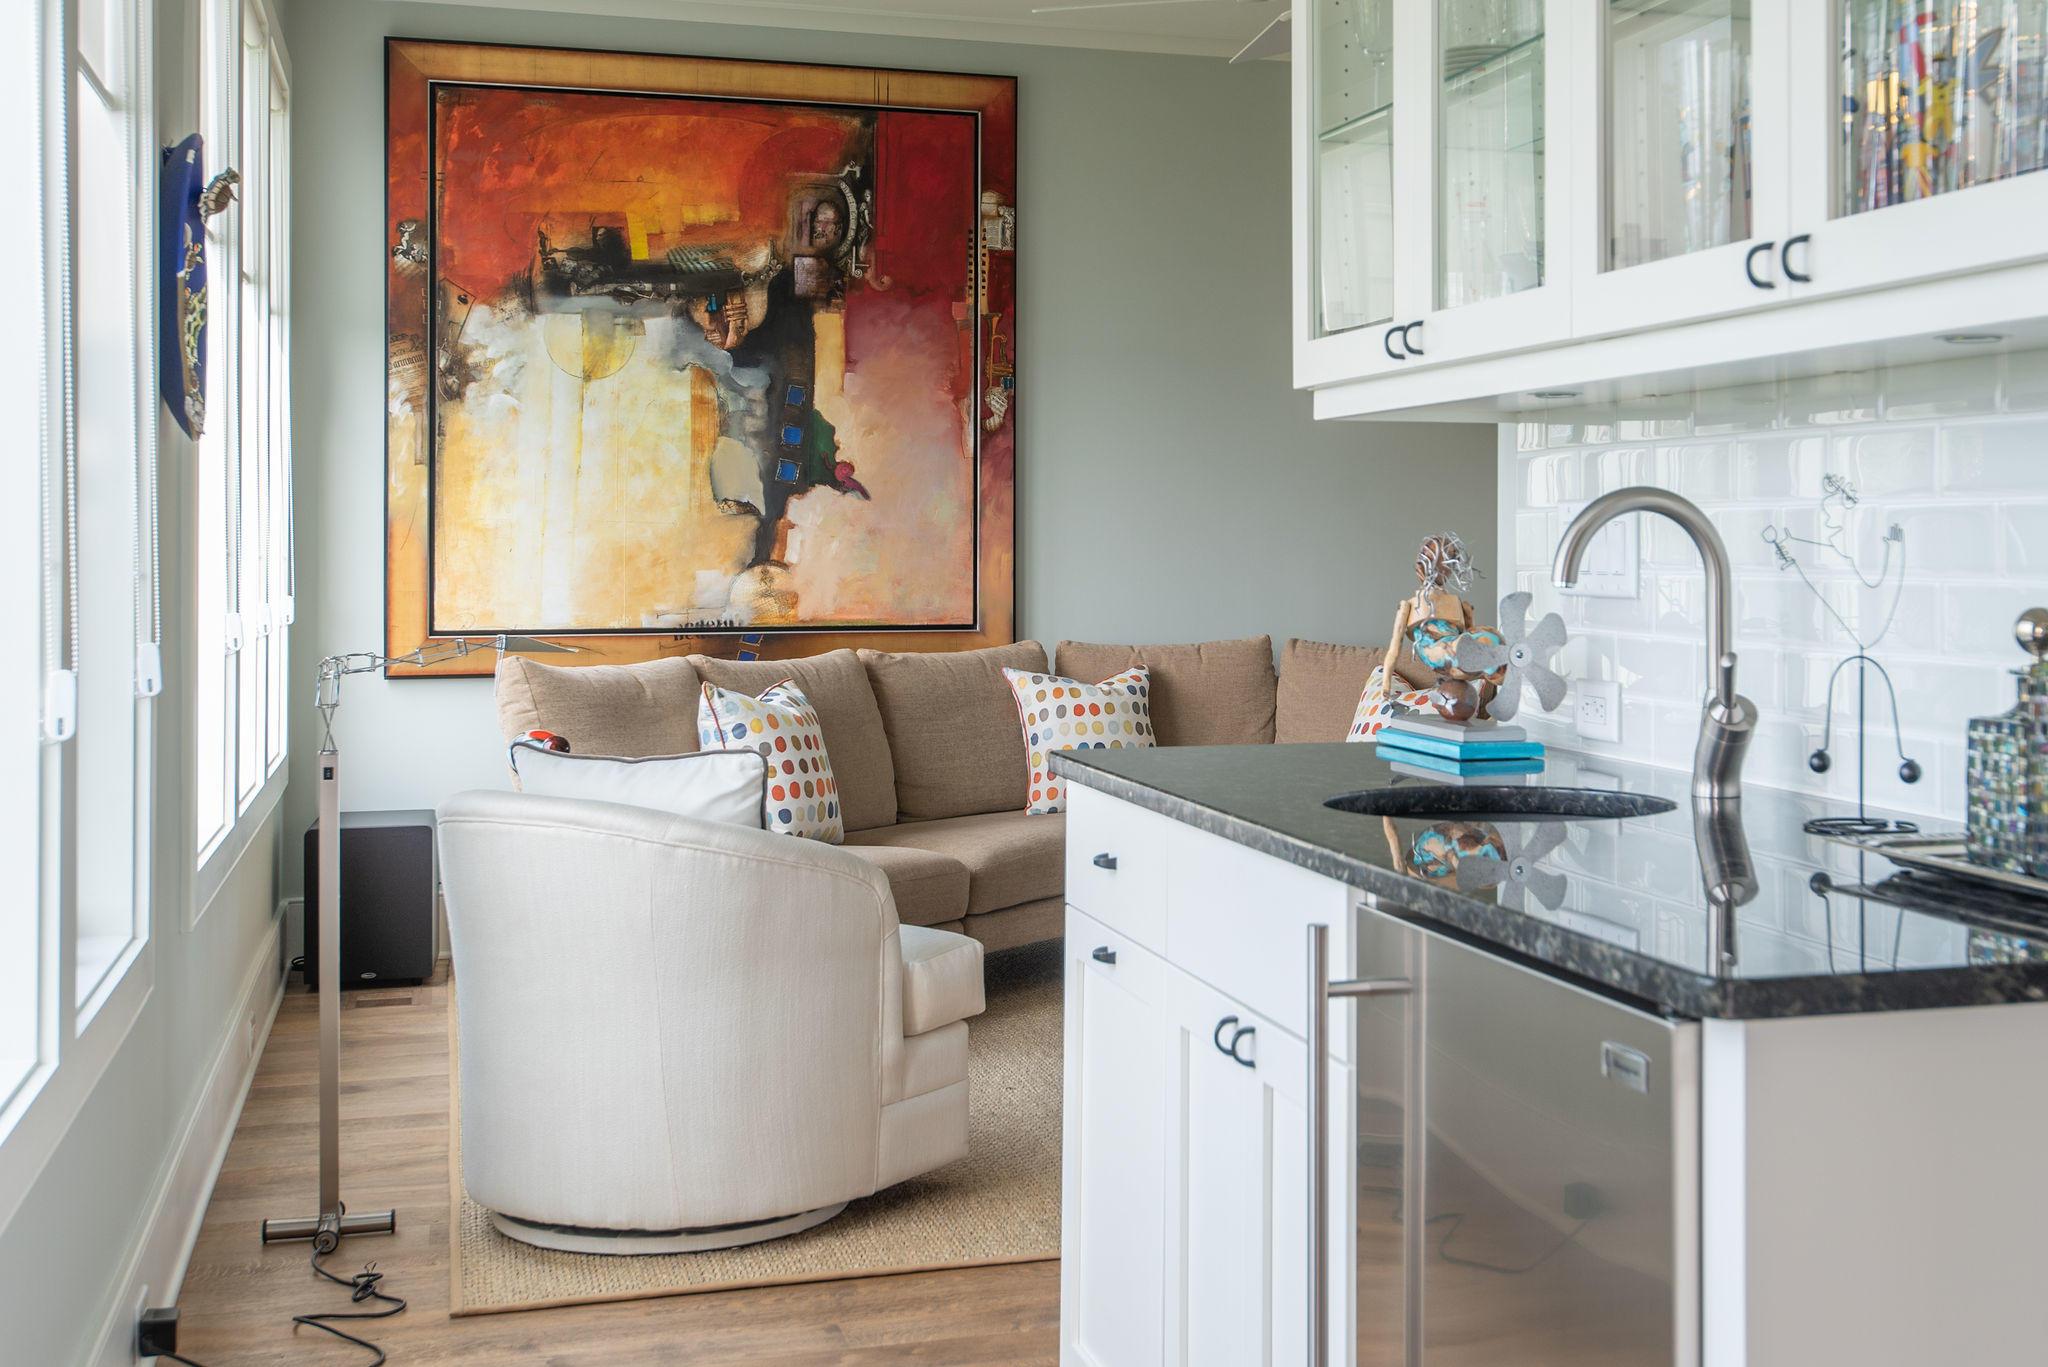 Seabrook Island Homes For Sale - 3135 Marshgate, Seabrook Island, SC - 30